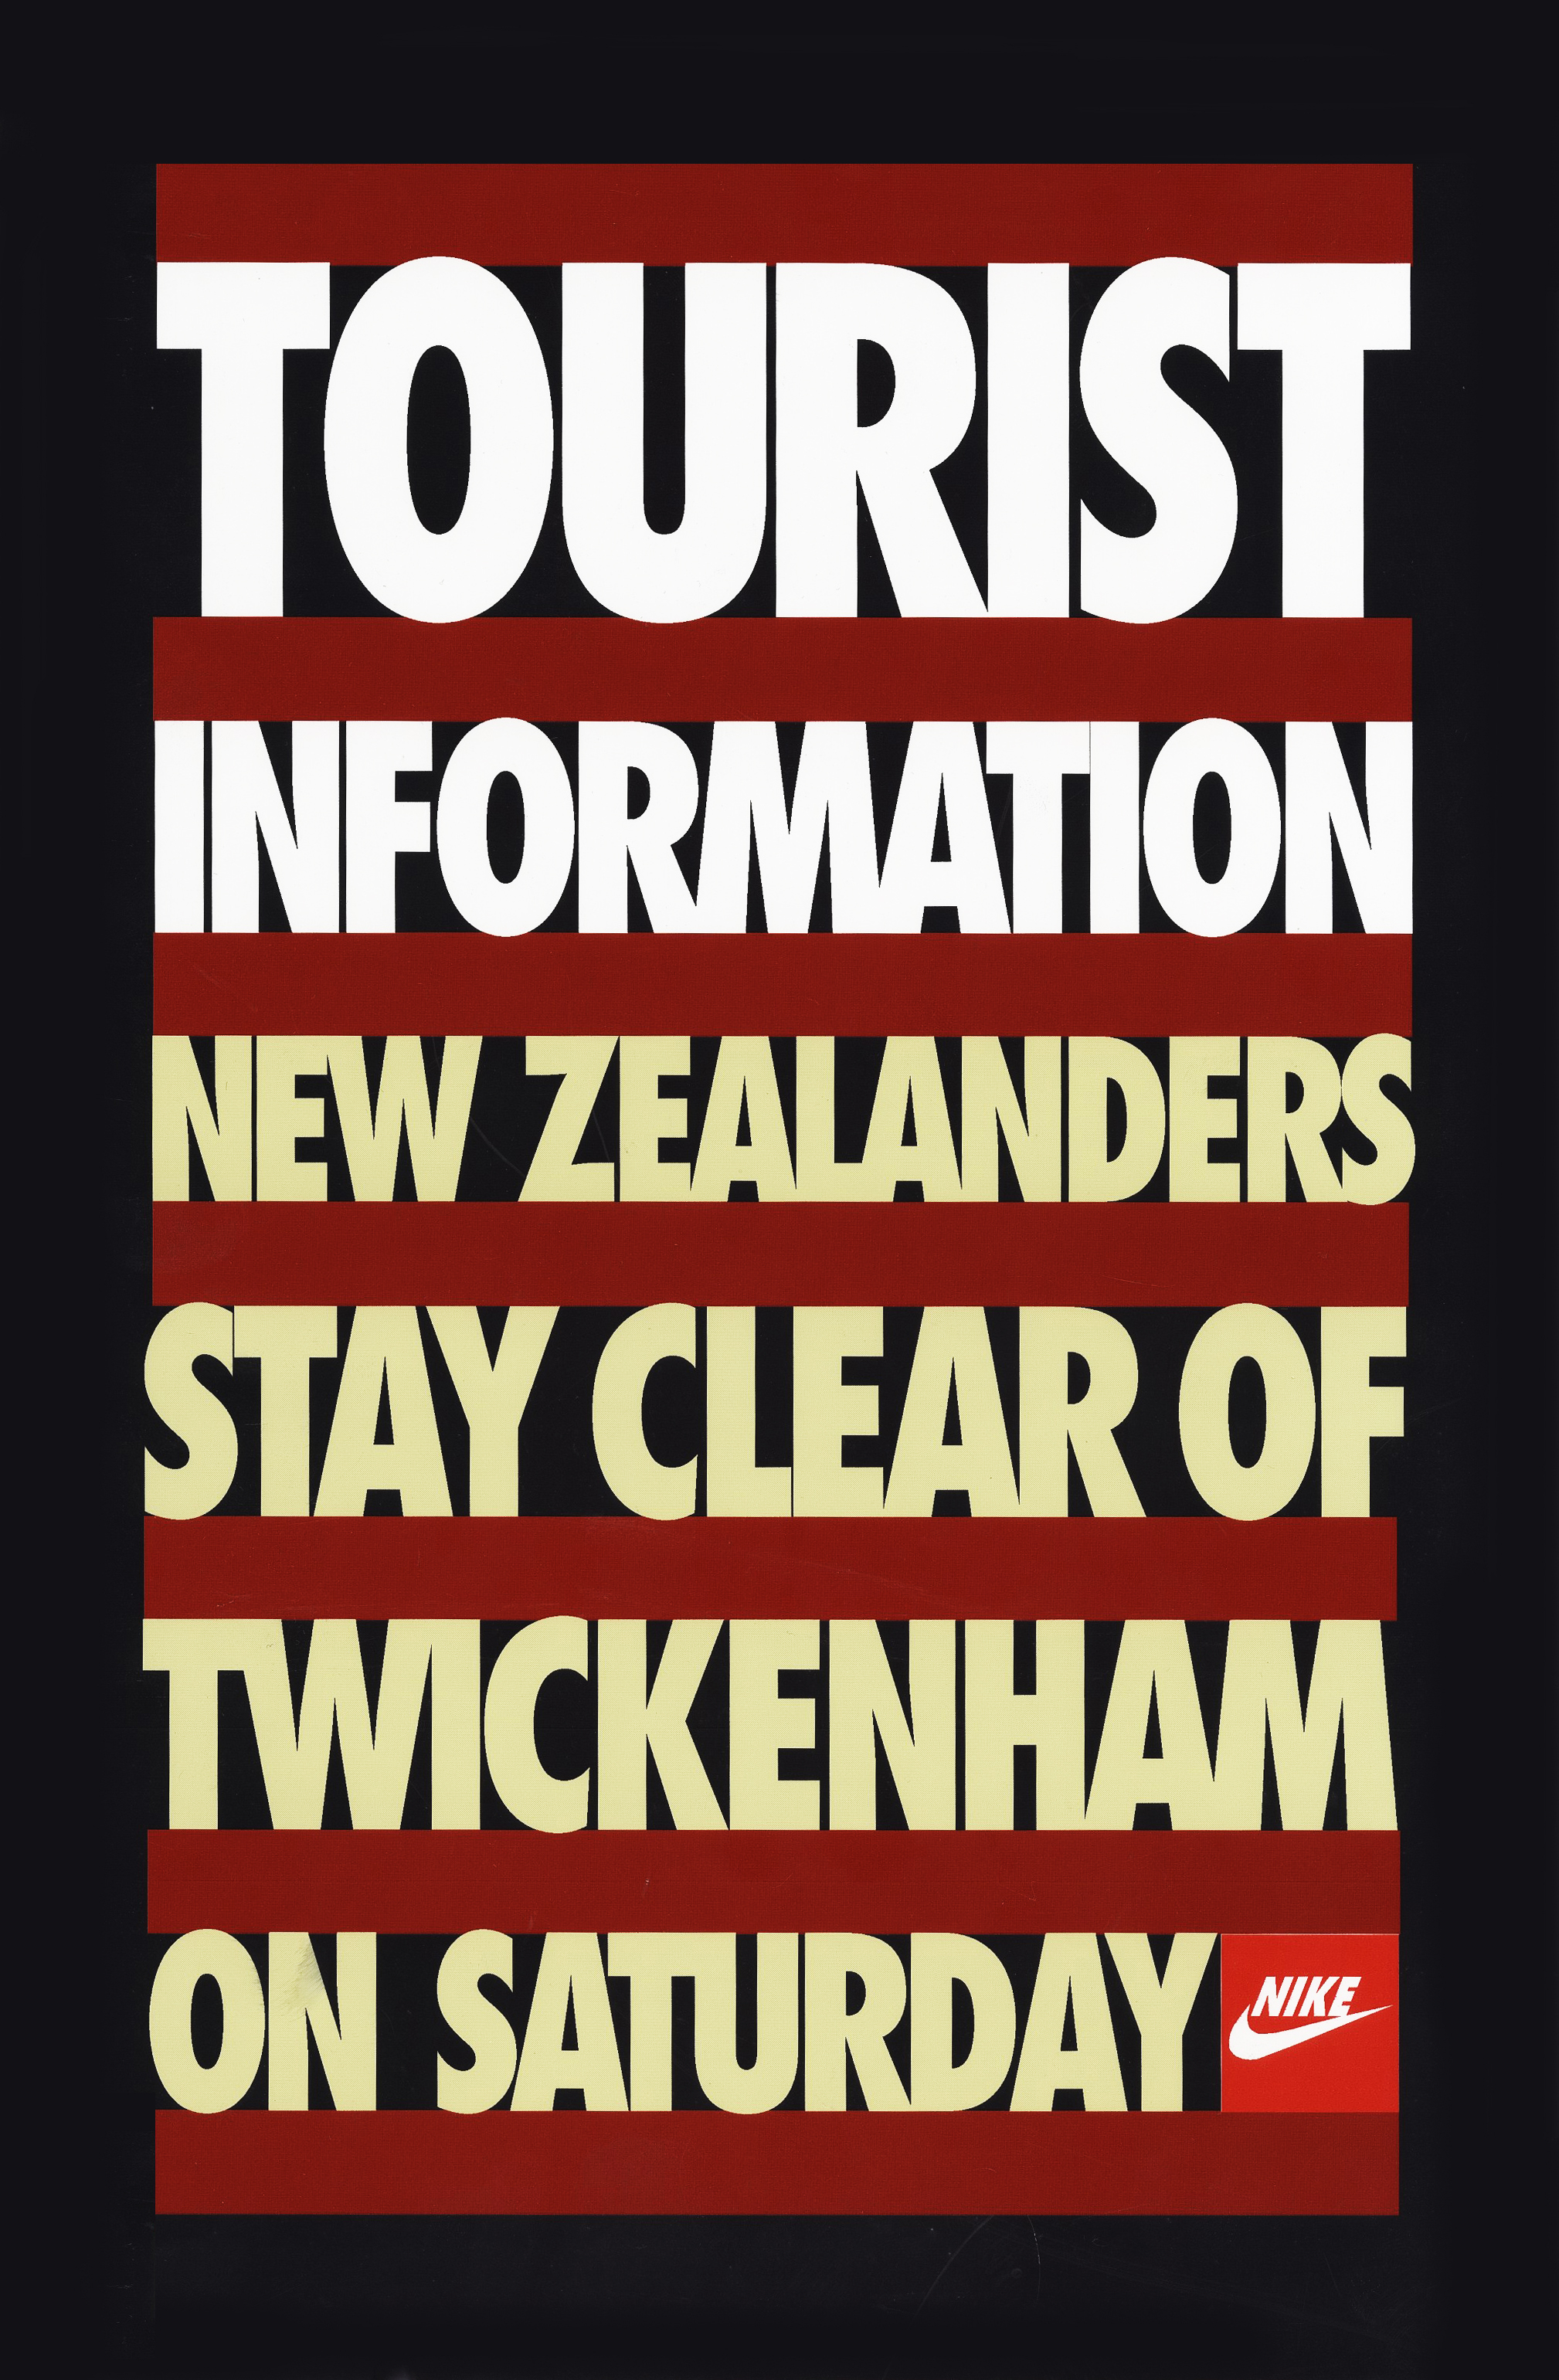 'Tourist Information  Rough' Nike, SPDC&J.jpg